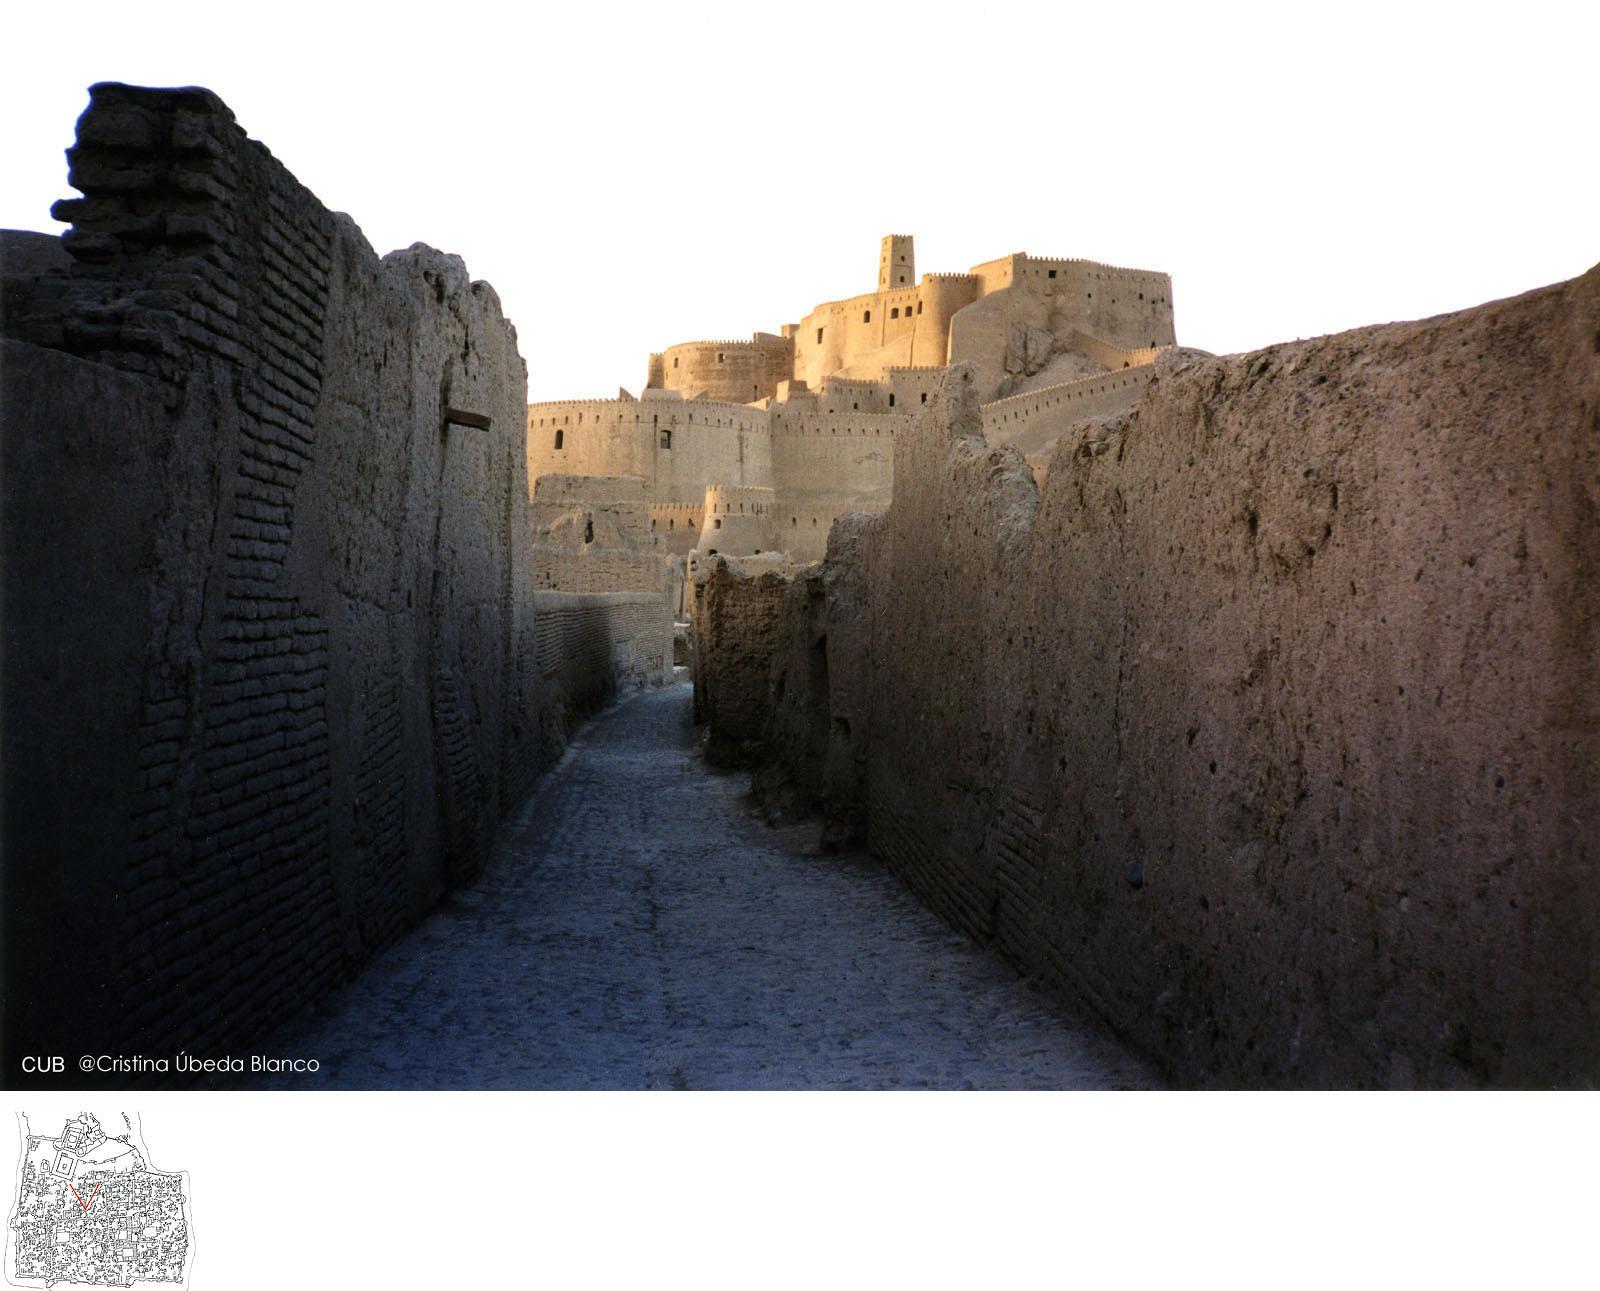 danielvillalobos-architecturalexhibition-bam-architectureofmud-19